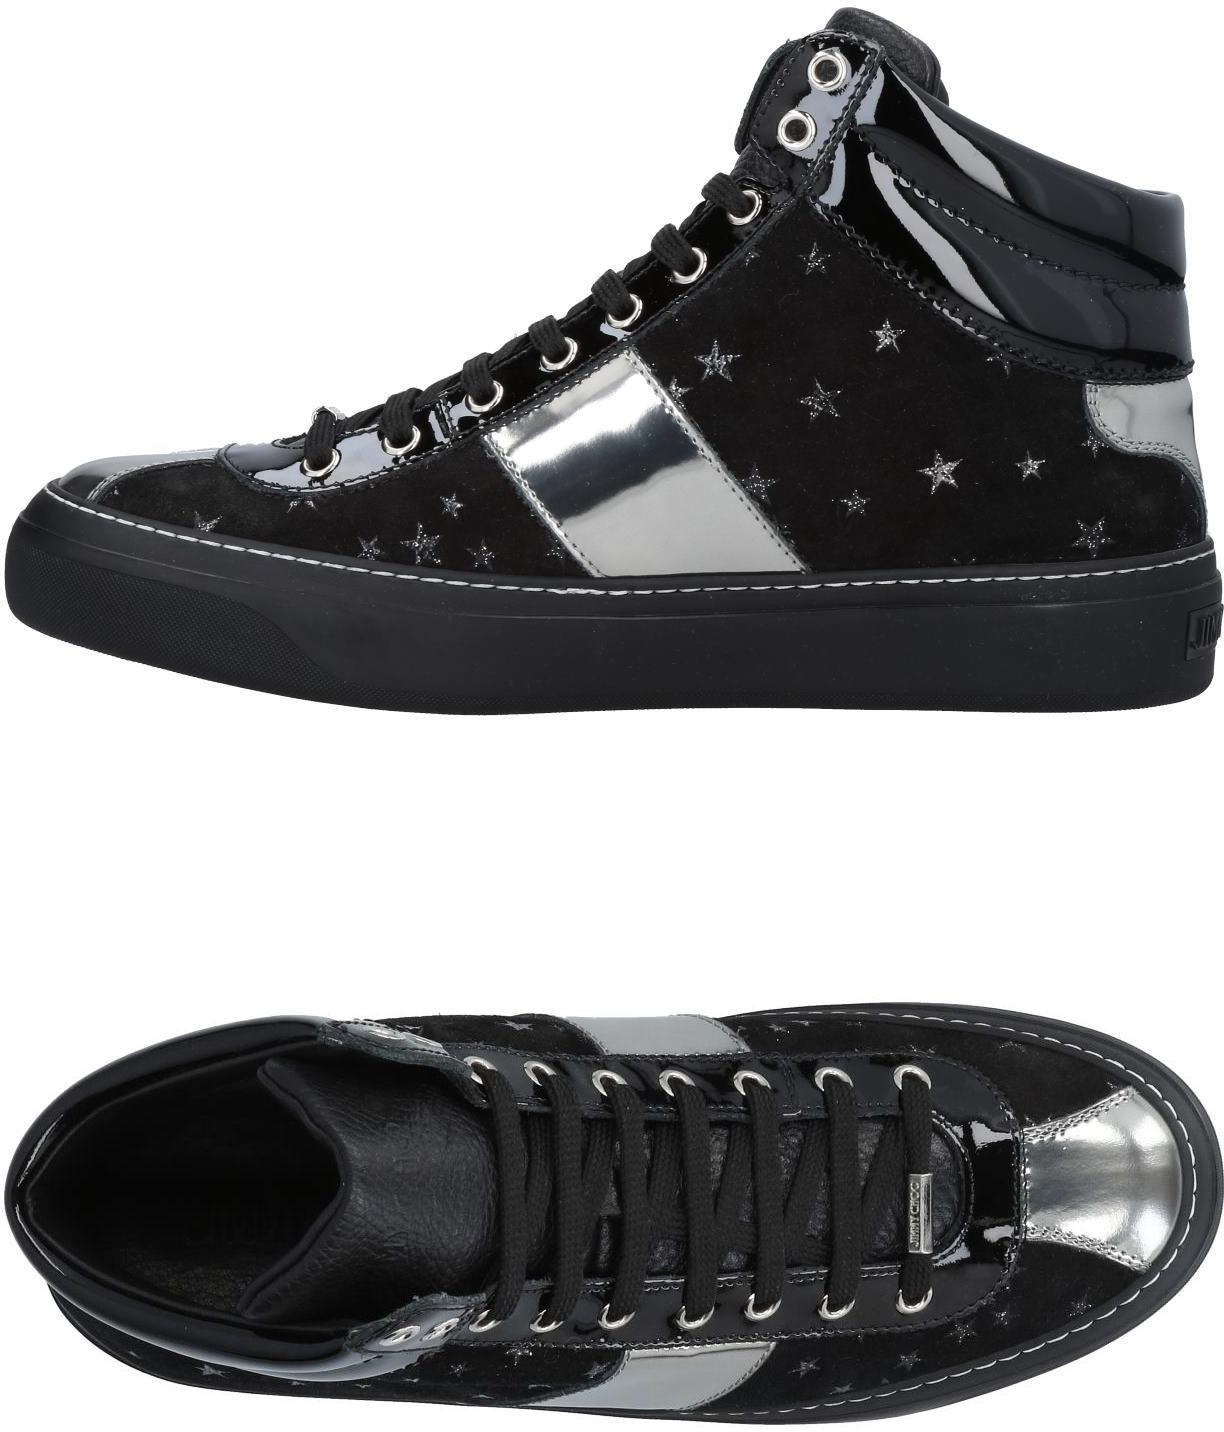 JIMMY CHOO - CALZATURE - Sneakers   Tennis shoes alte -  b4b756e46b0